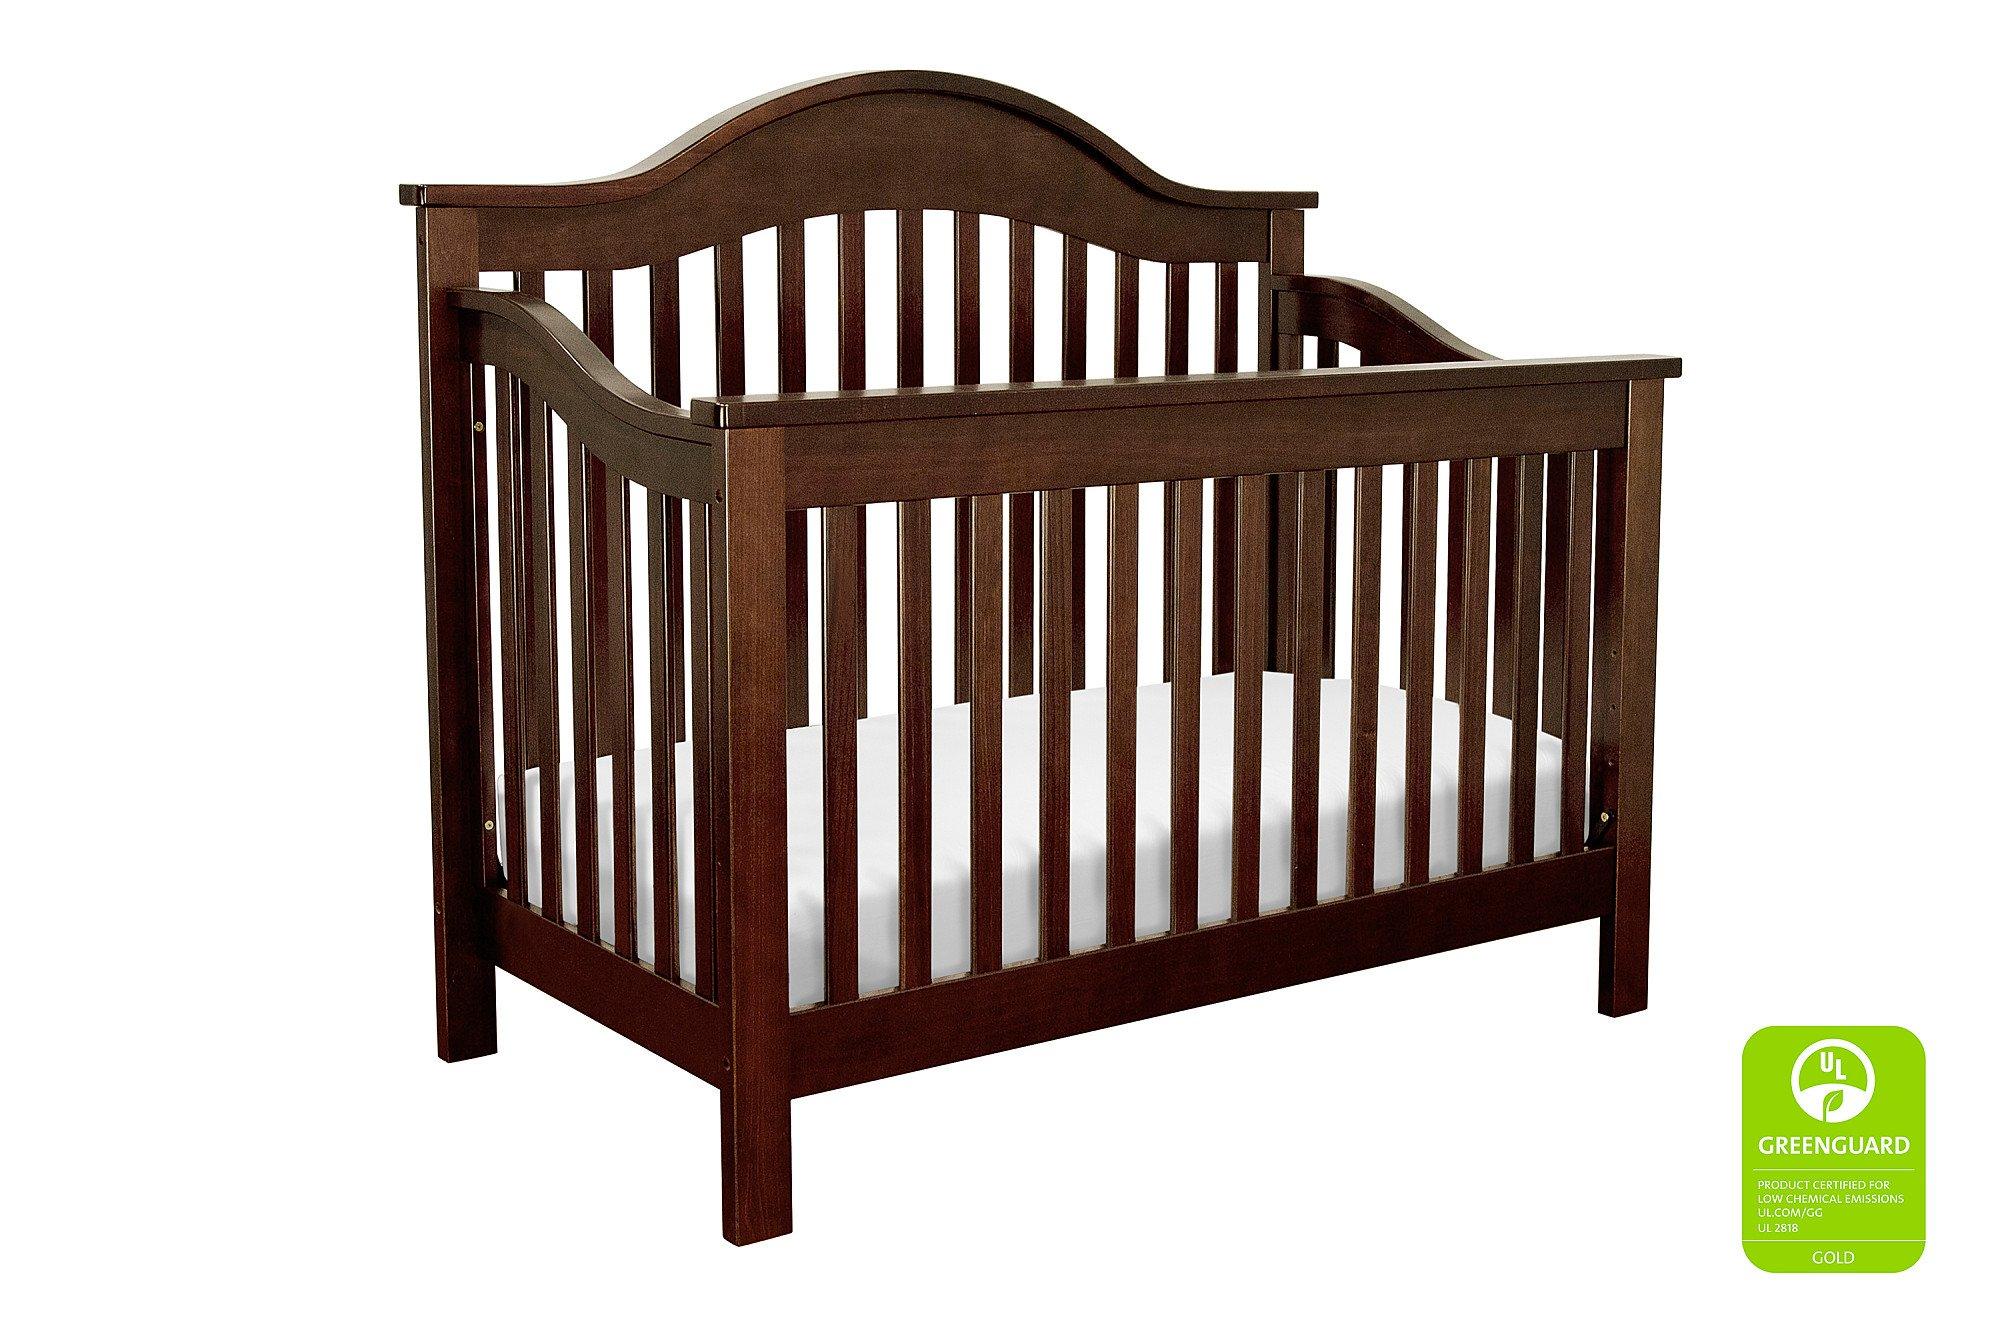 Davinci Jayden 4-in-1 Crib Full Size Conversion Kit Bed Rails - Espresso